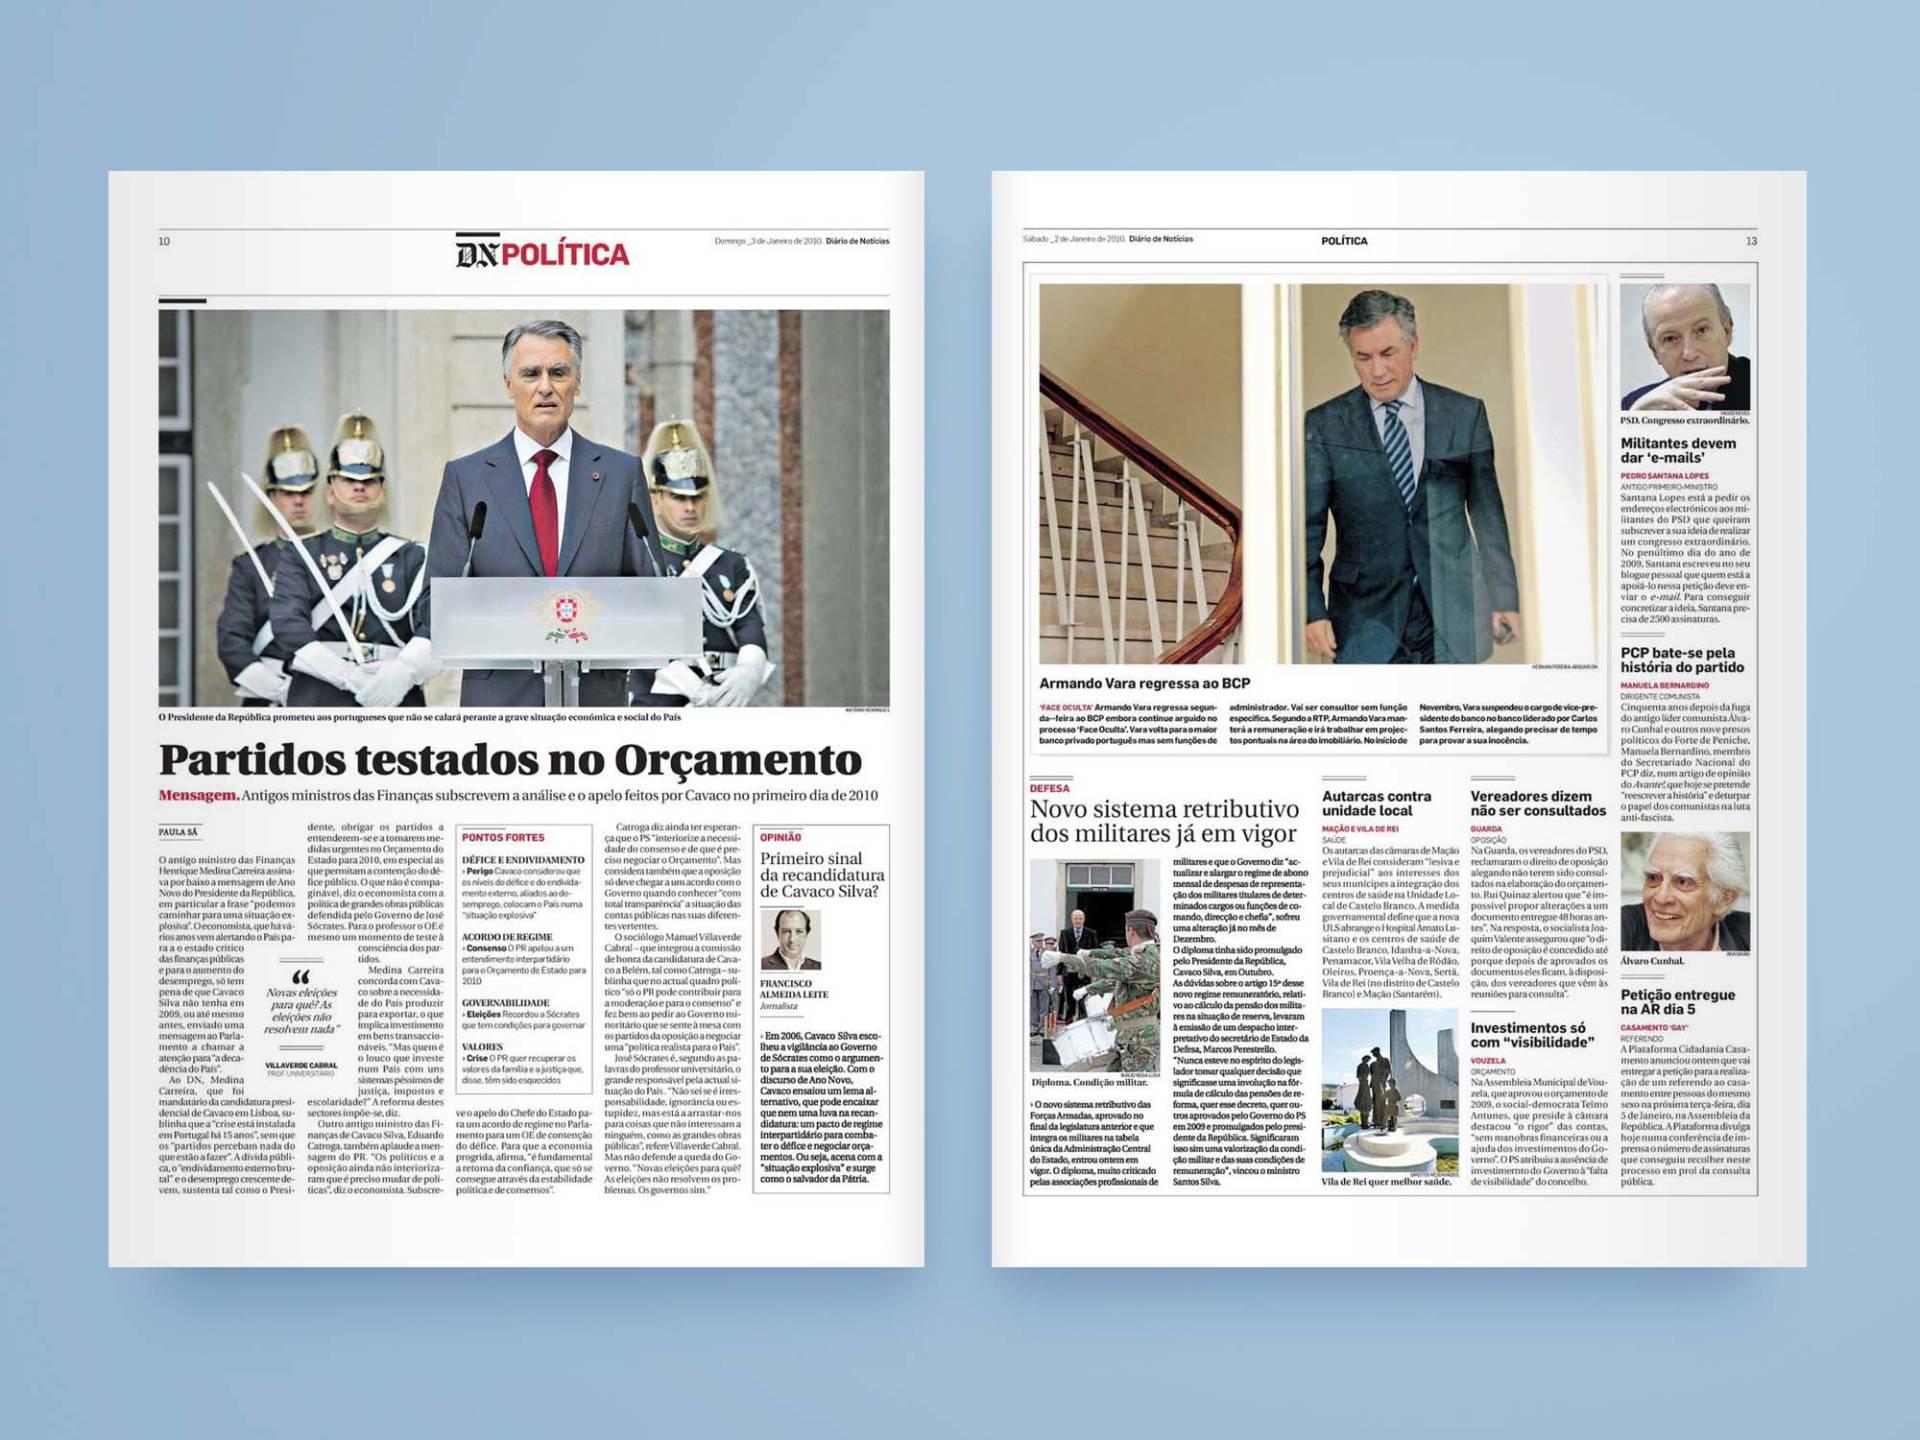 Diario_De_Noticias_04_Wenceslau_News_Design